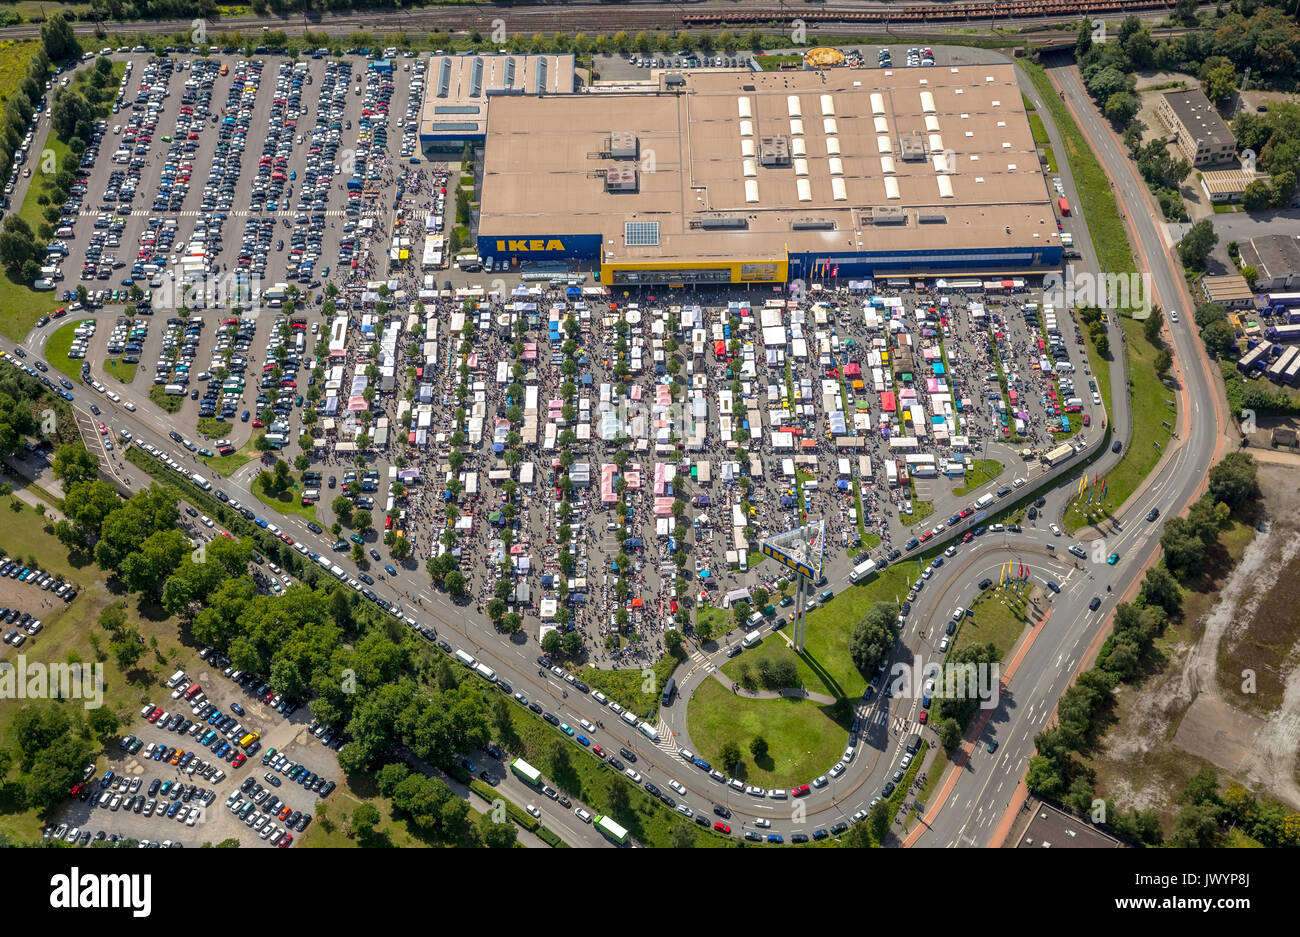 Ikea Möbel Stockfotos & Ikea Möbel Bilder - Alamy